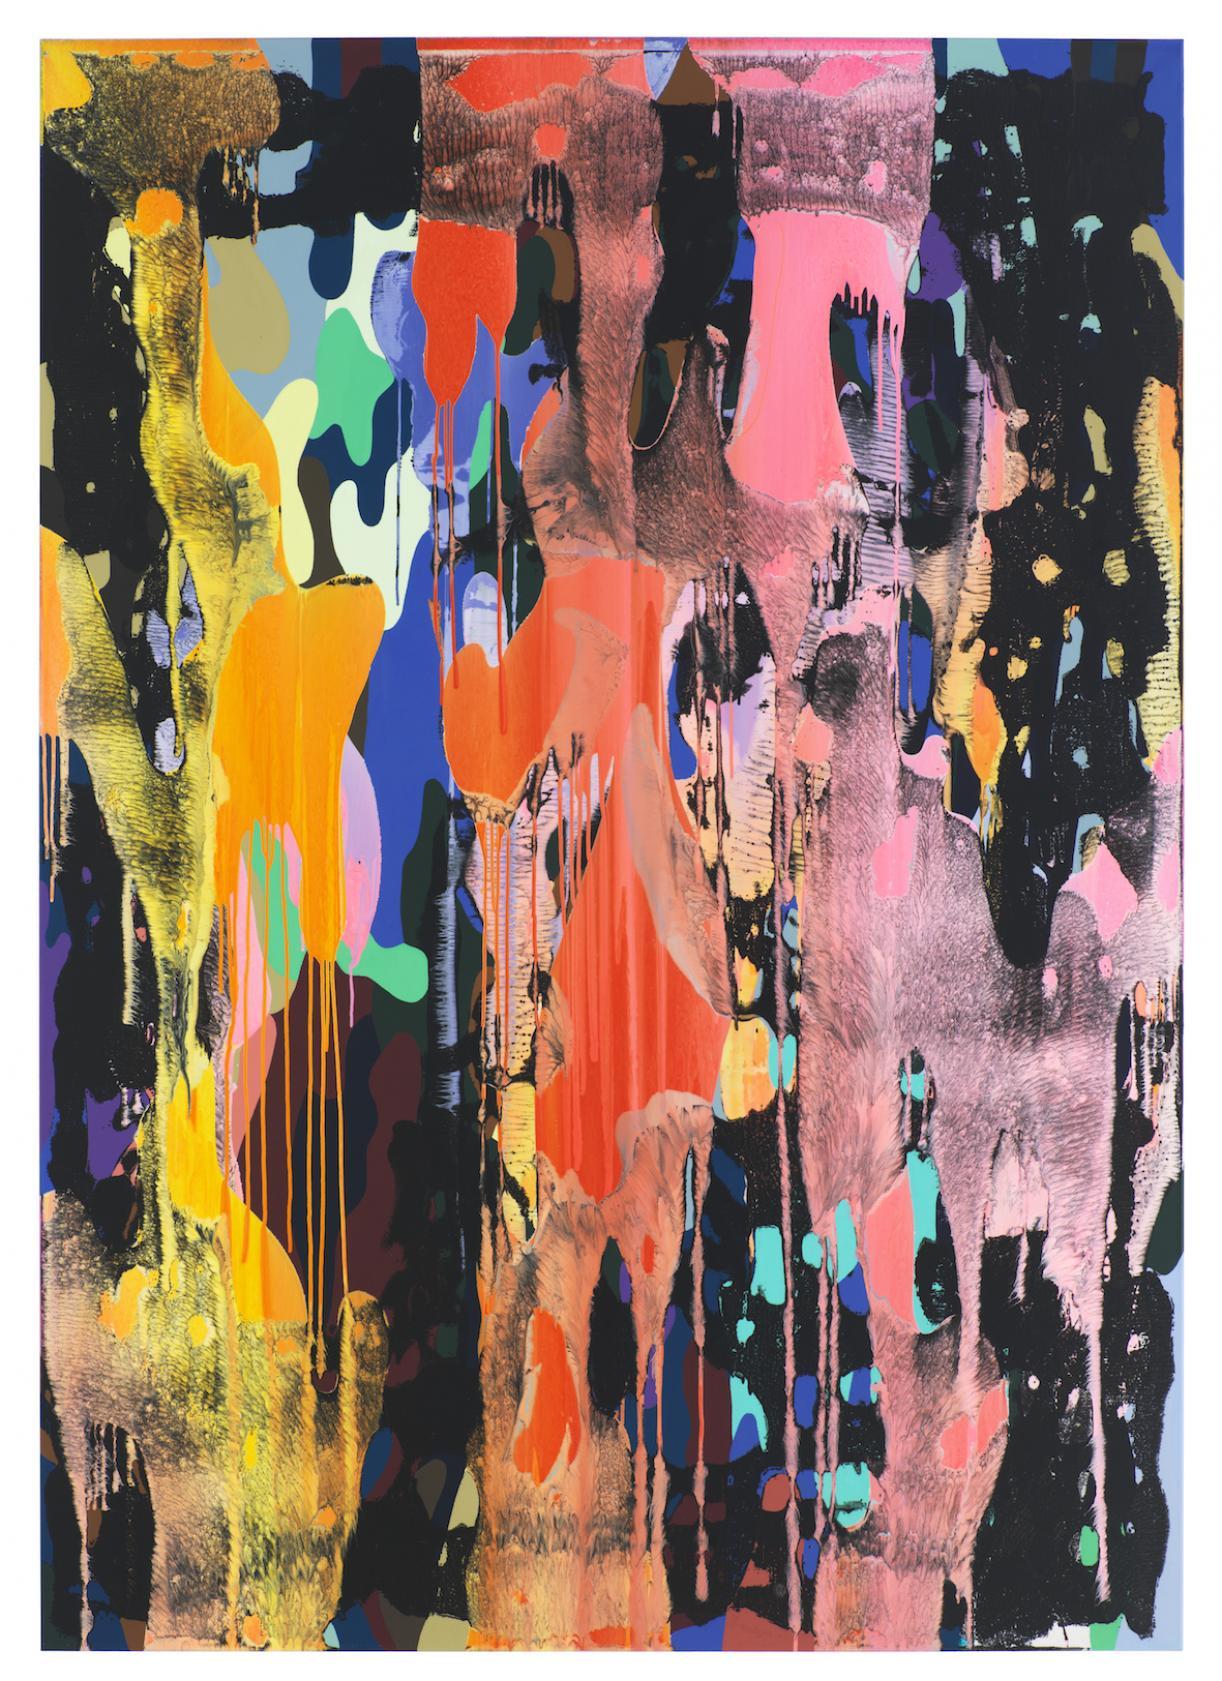 Christine Streuli, Warainting_005, 2016/17, Mixed media on canvas, 243,5 x 173 cm